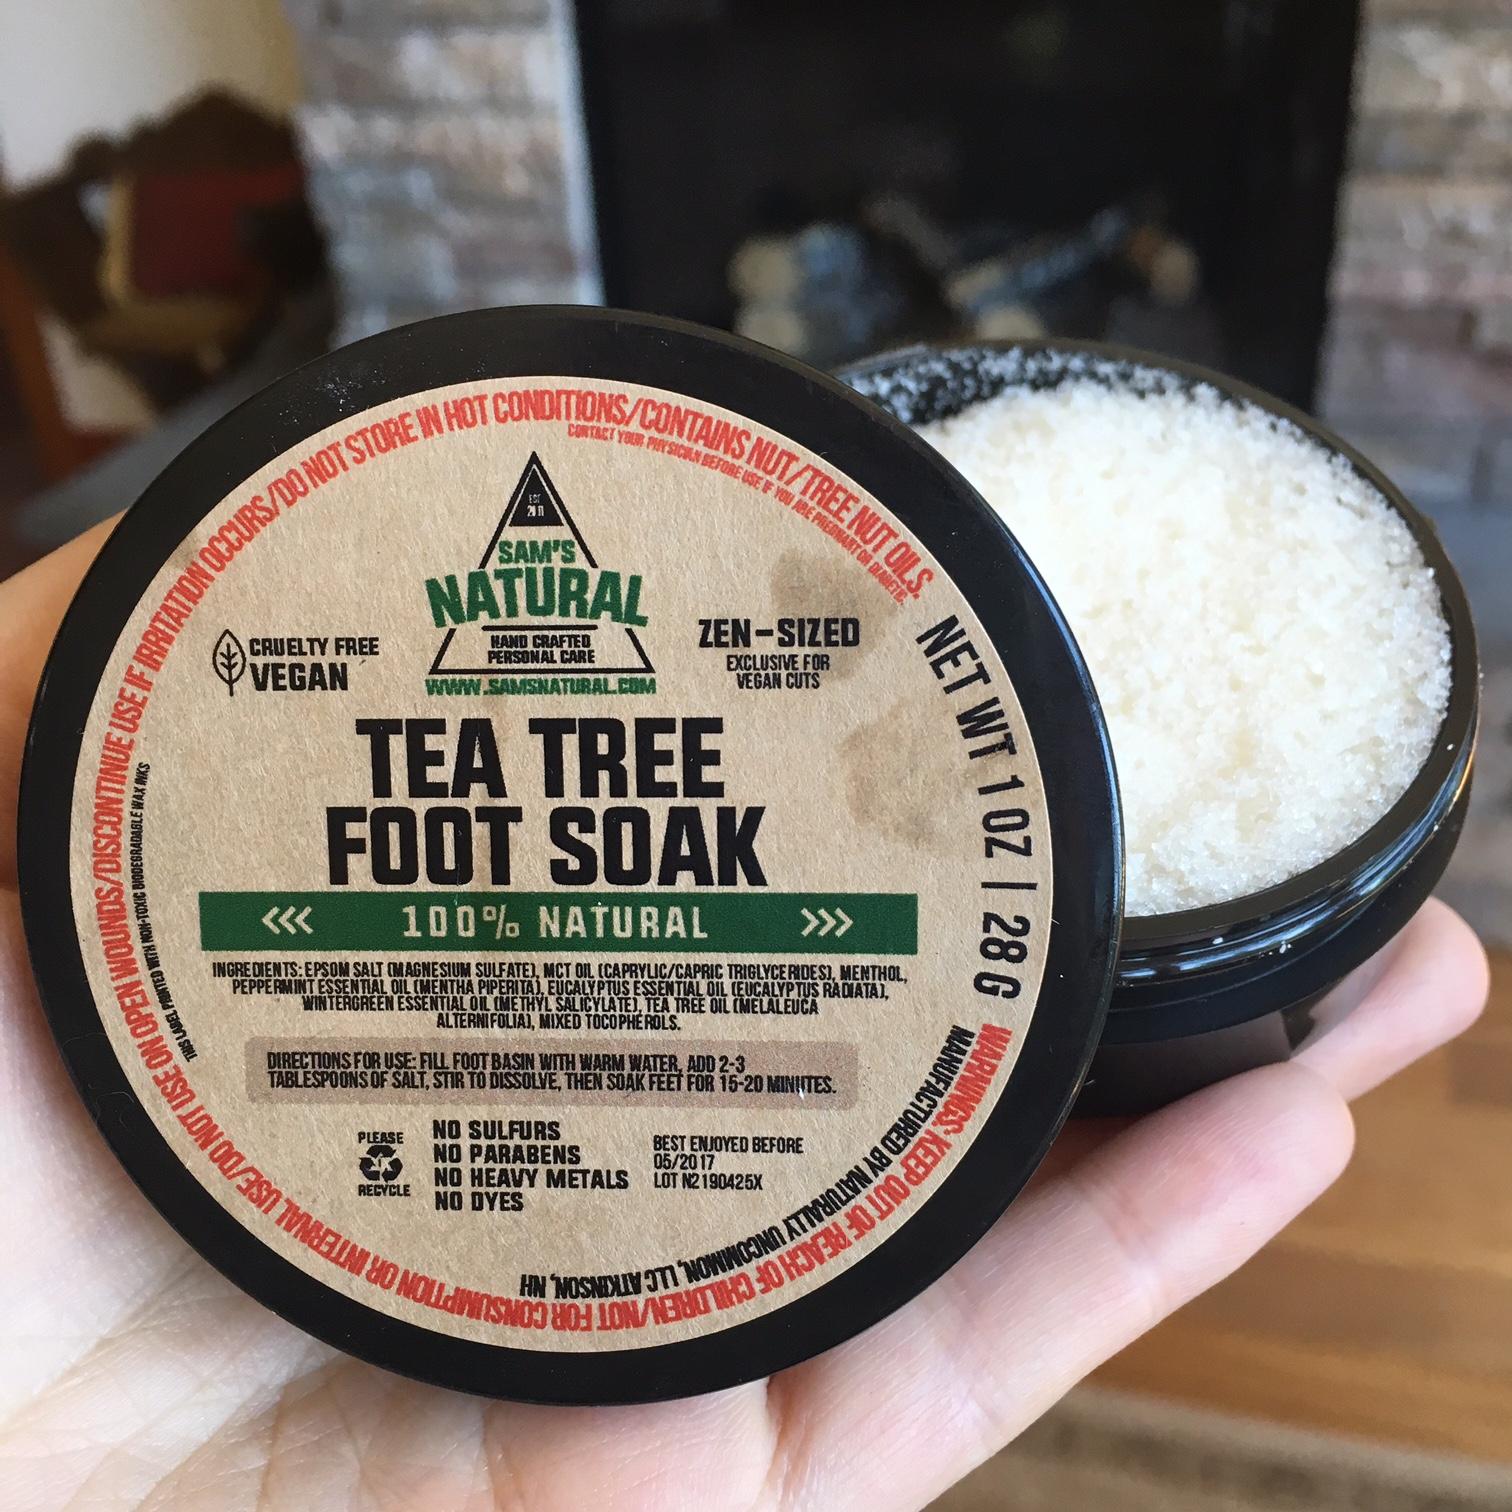 Sams Natural Tea Tree Foot Soak